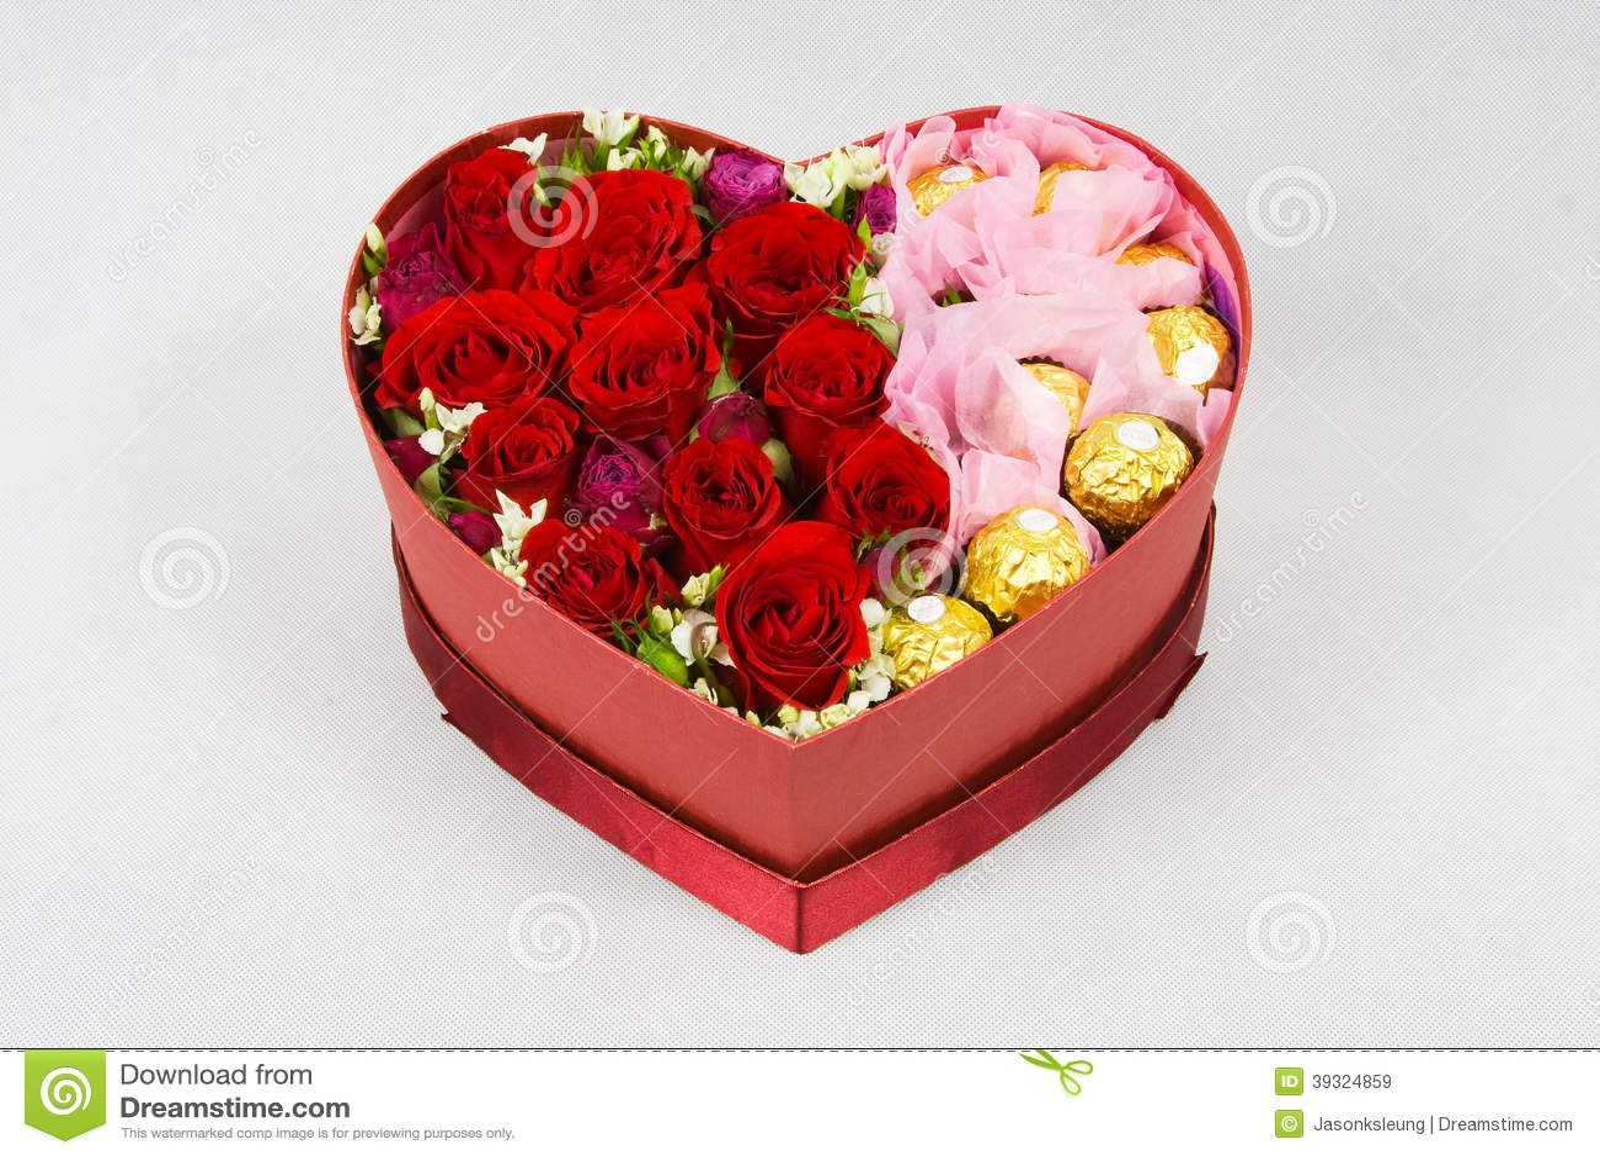 Heart Shaped Box Of Flowers Stock Photo Image 39324859